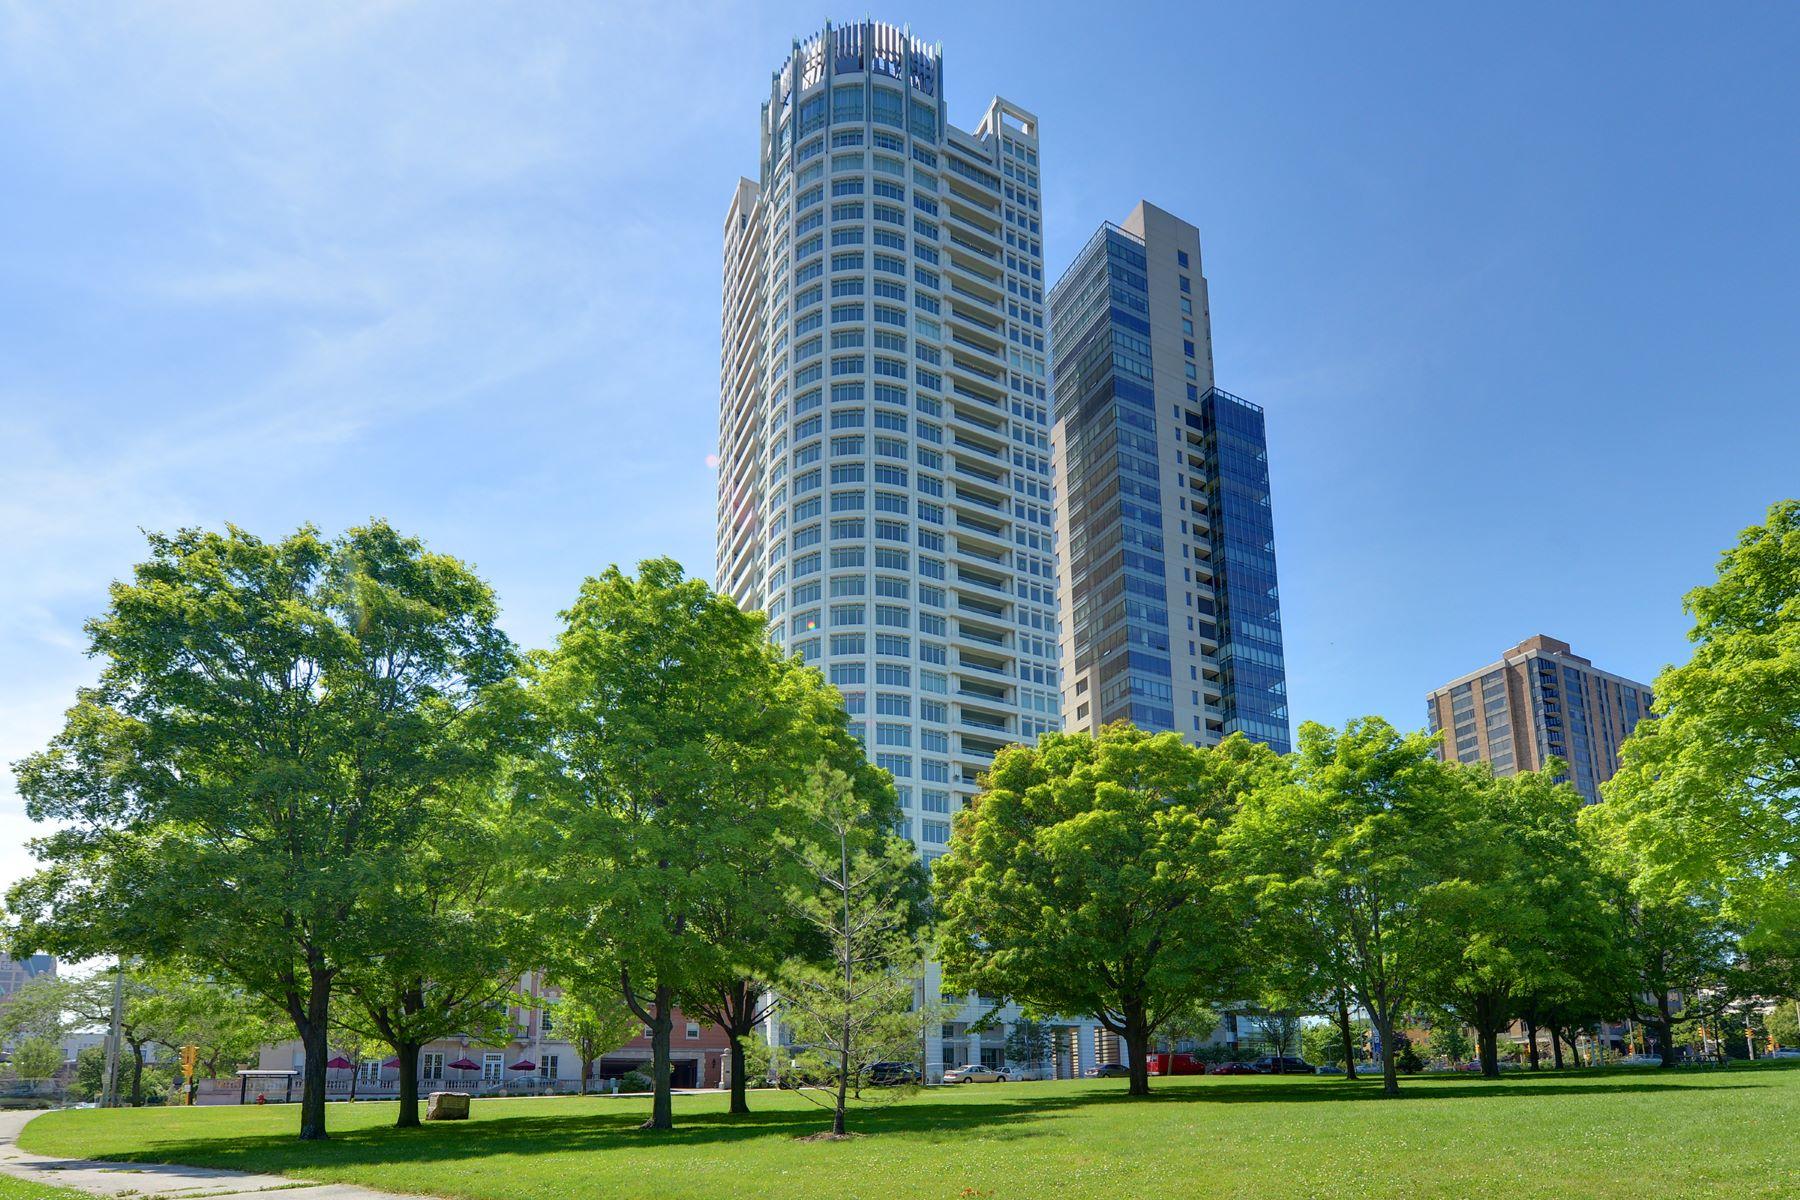 Condominium for Sale at University Club Tower Custom Residence 825 N. Prospect Avenue #601 Milwaukee, Wisconsin 53202 United States